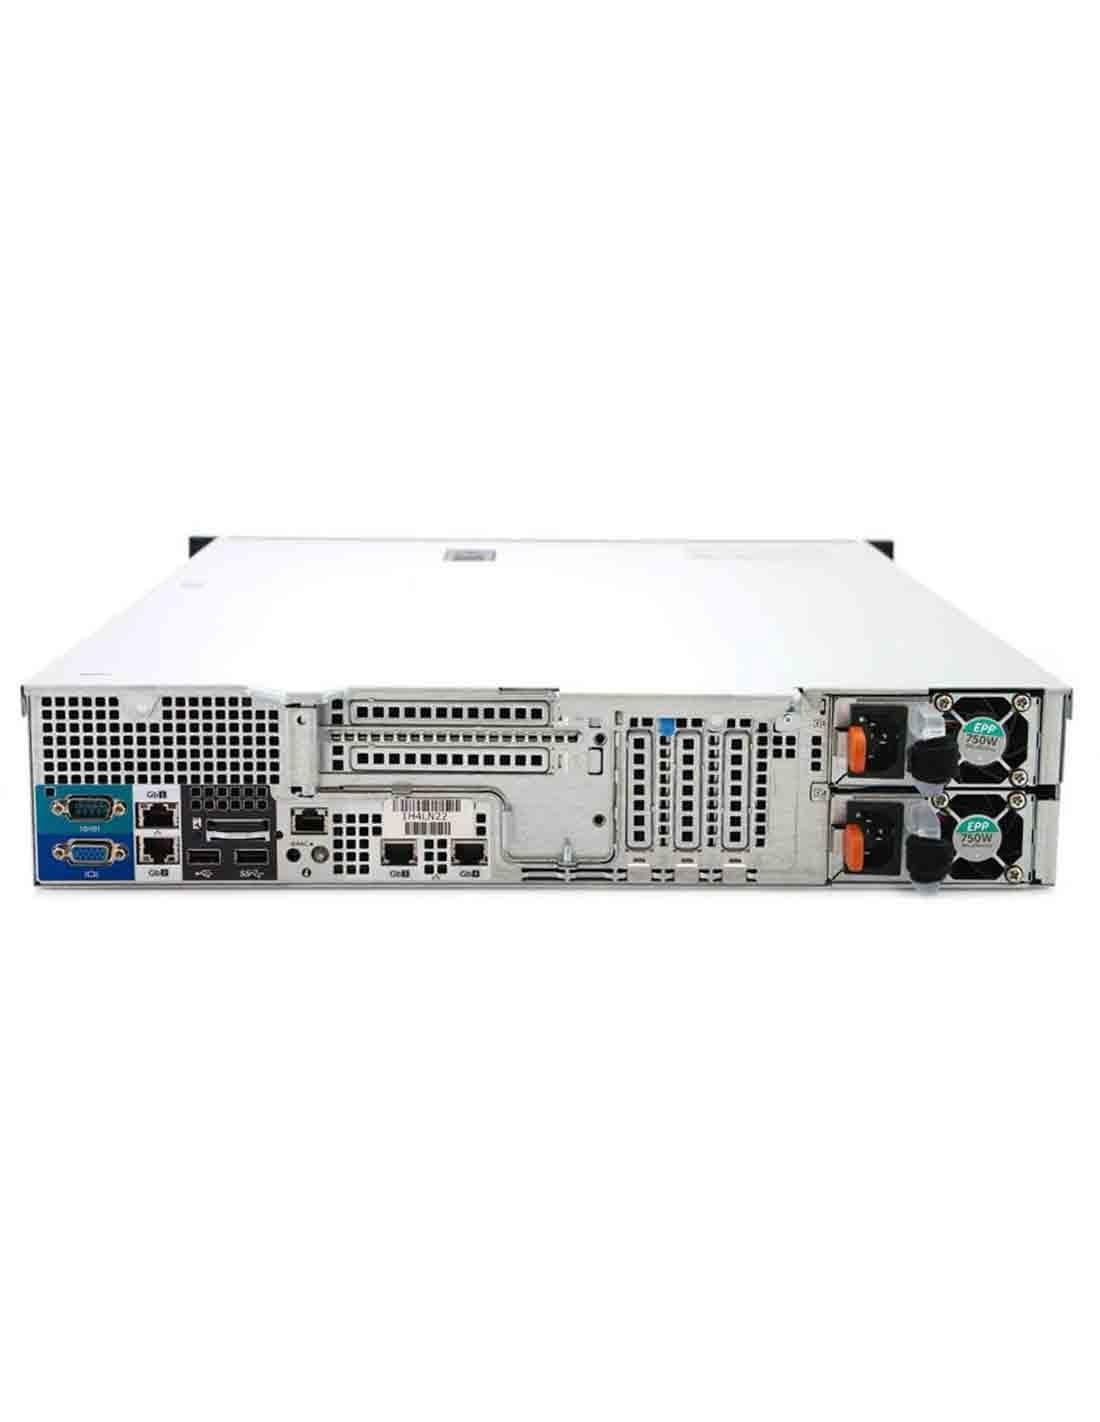 Dell PowerEdge R530 Rack Server Intel Xeon E5-2620v3 delivers high performance